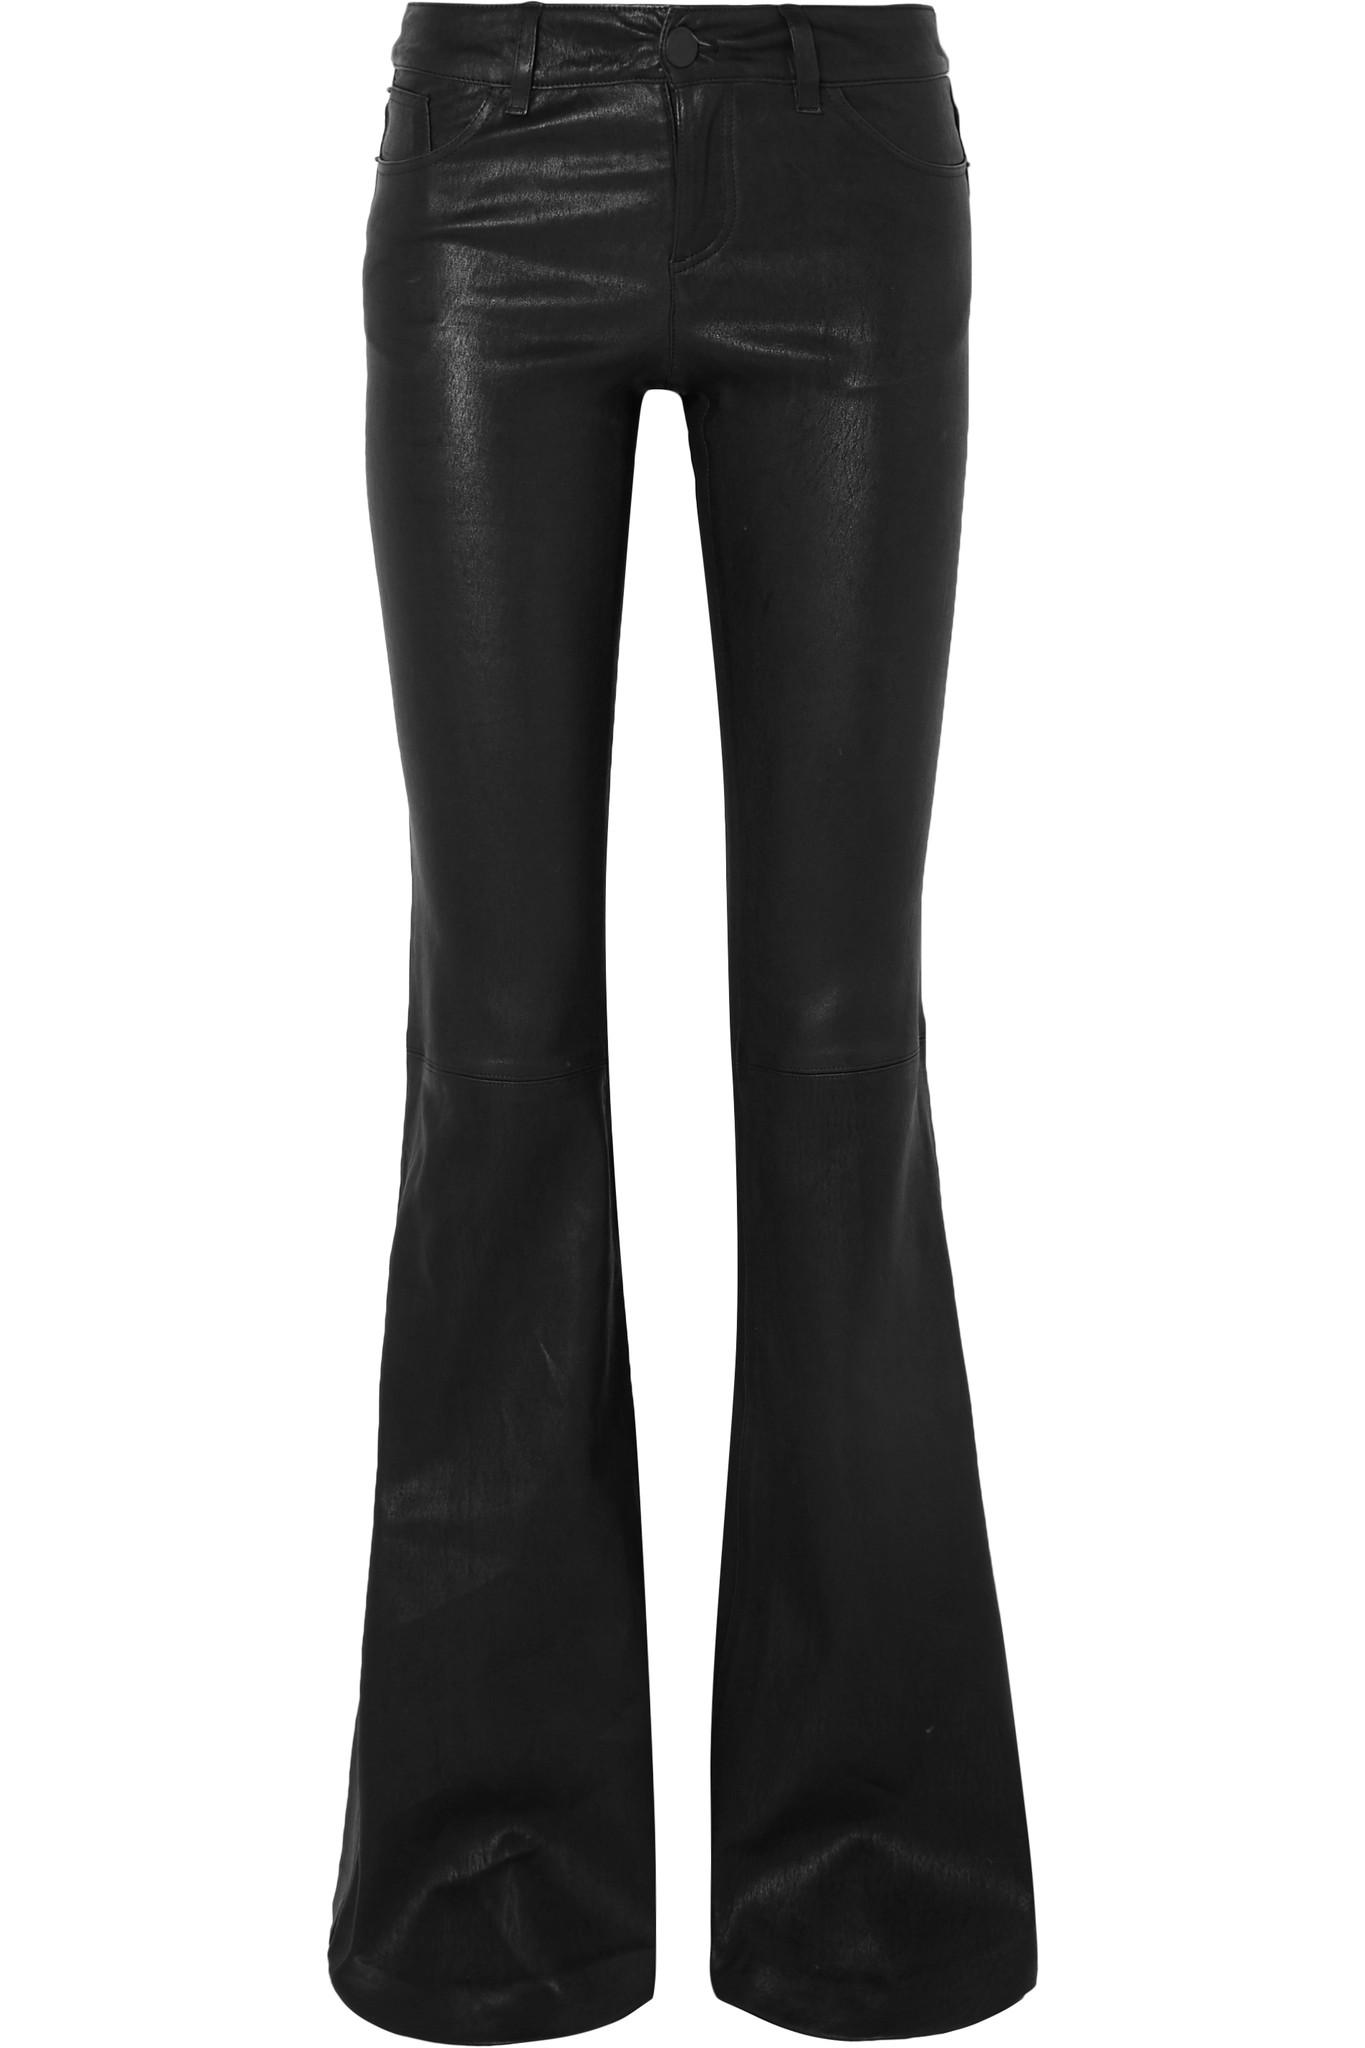 Alice   Olivia - Black Leather Flared Pants - Lyst